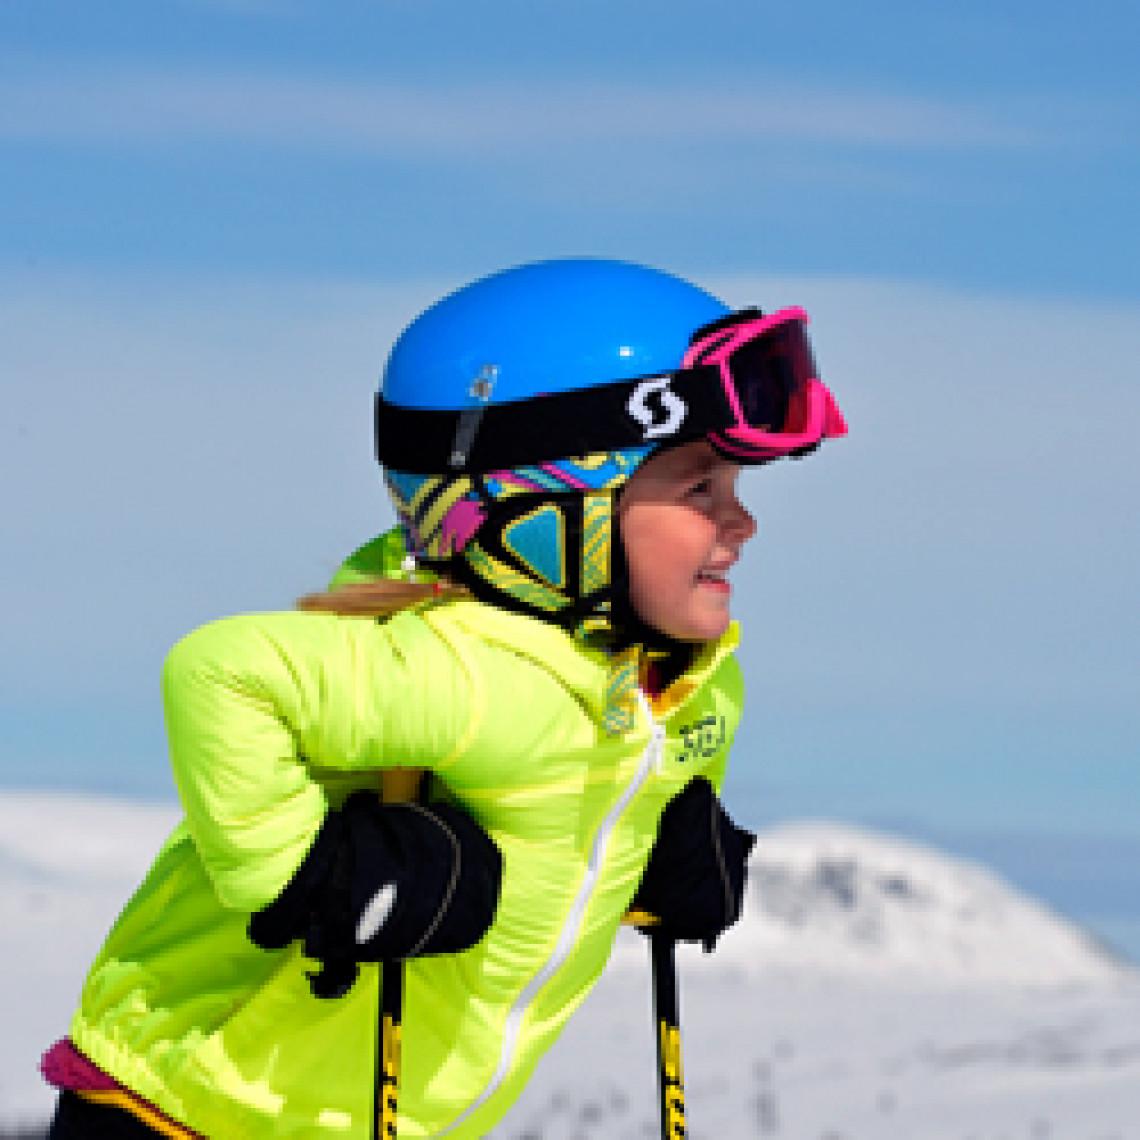 Pige på ski